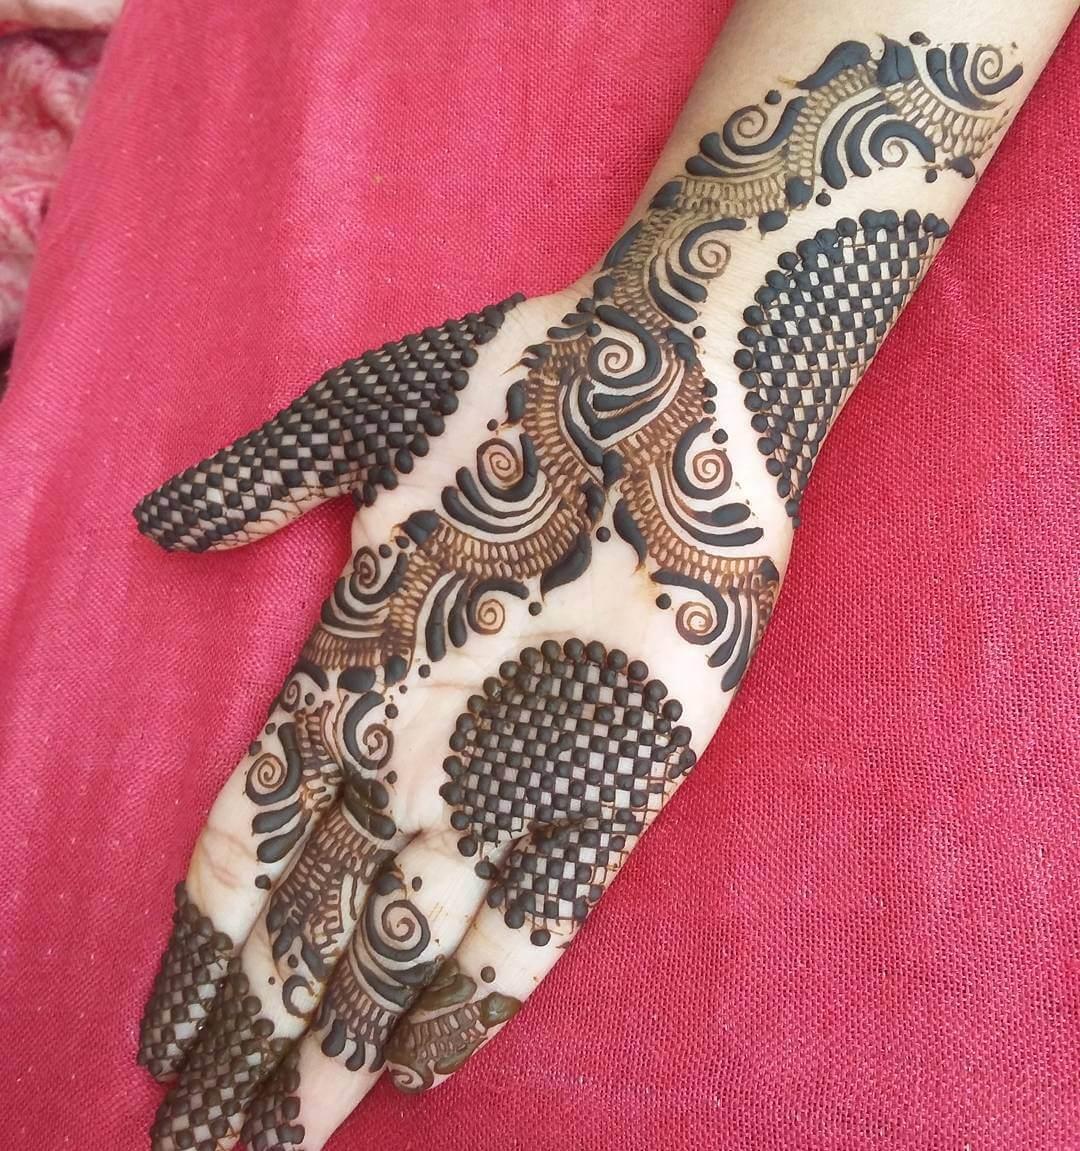 Imposing Spherical Lace Mehndi Full Hand Design